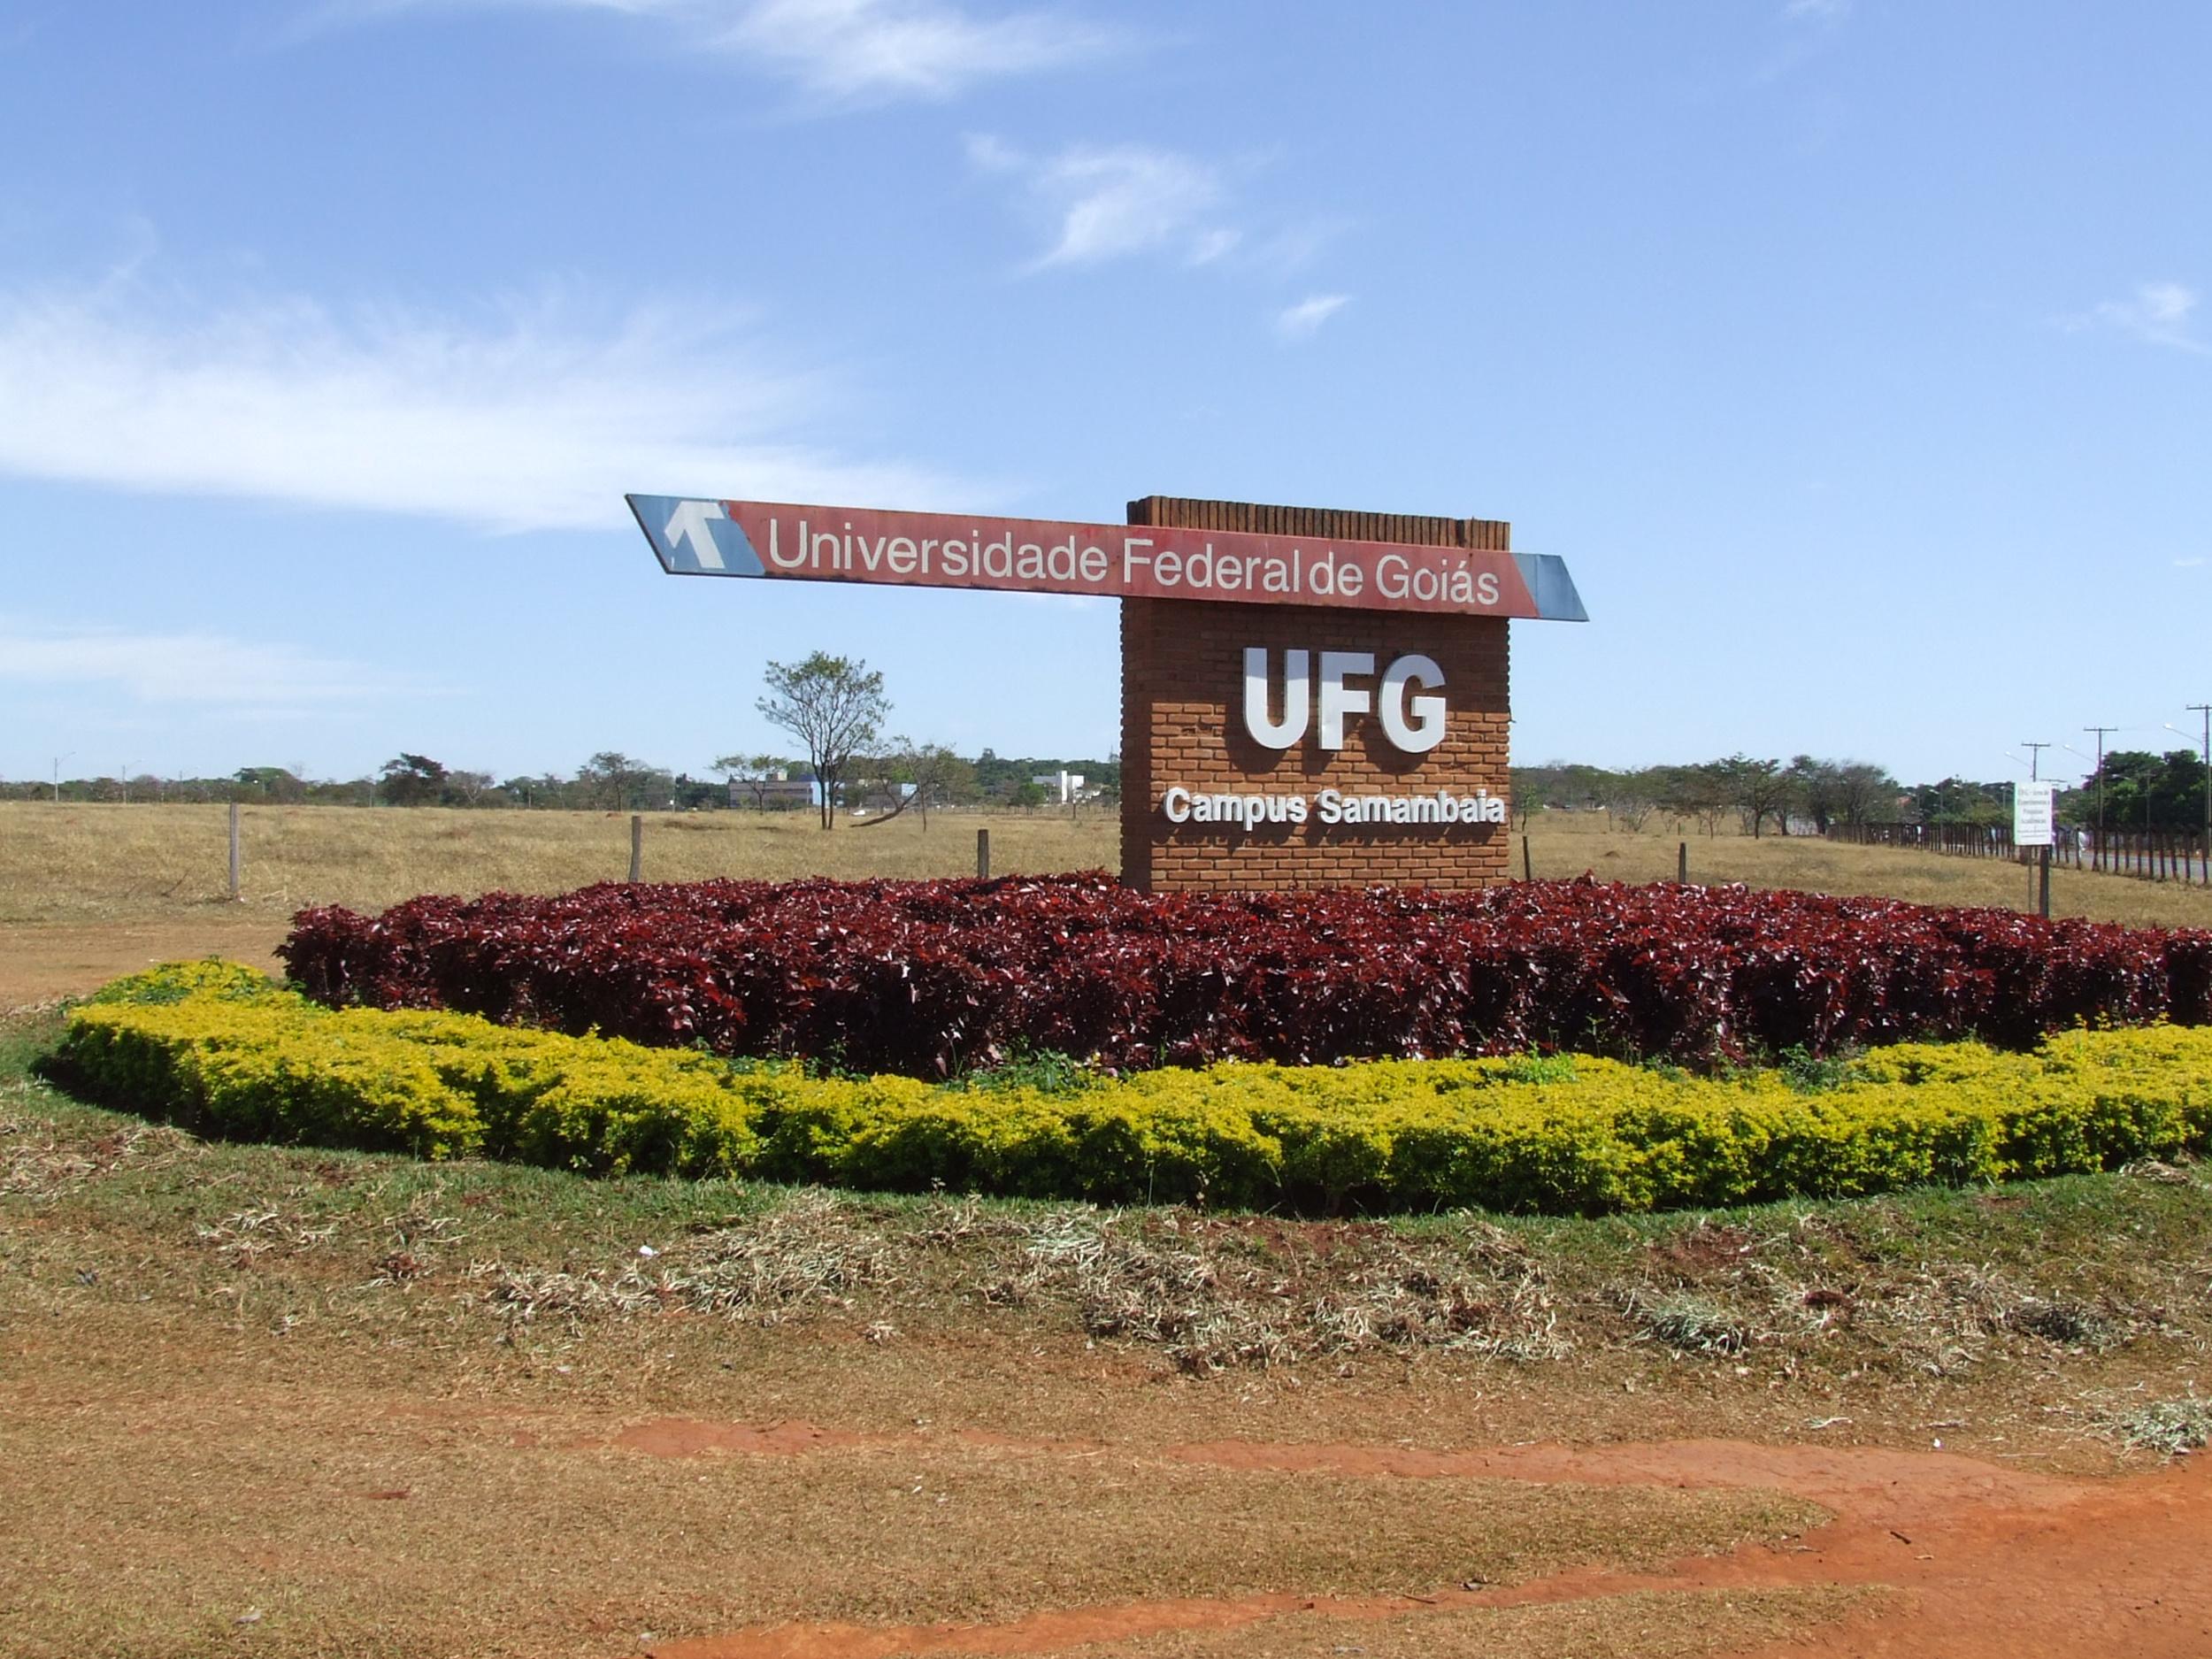 UFG - Universidade Federal de Goiás - Câmpus Samambaia